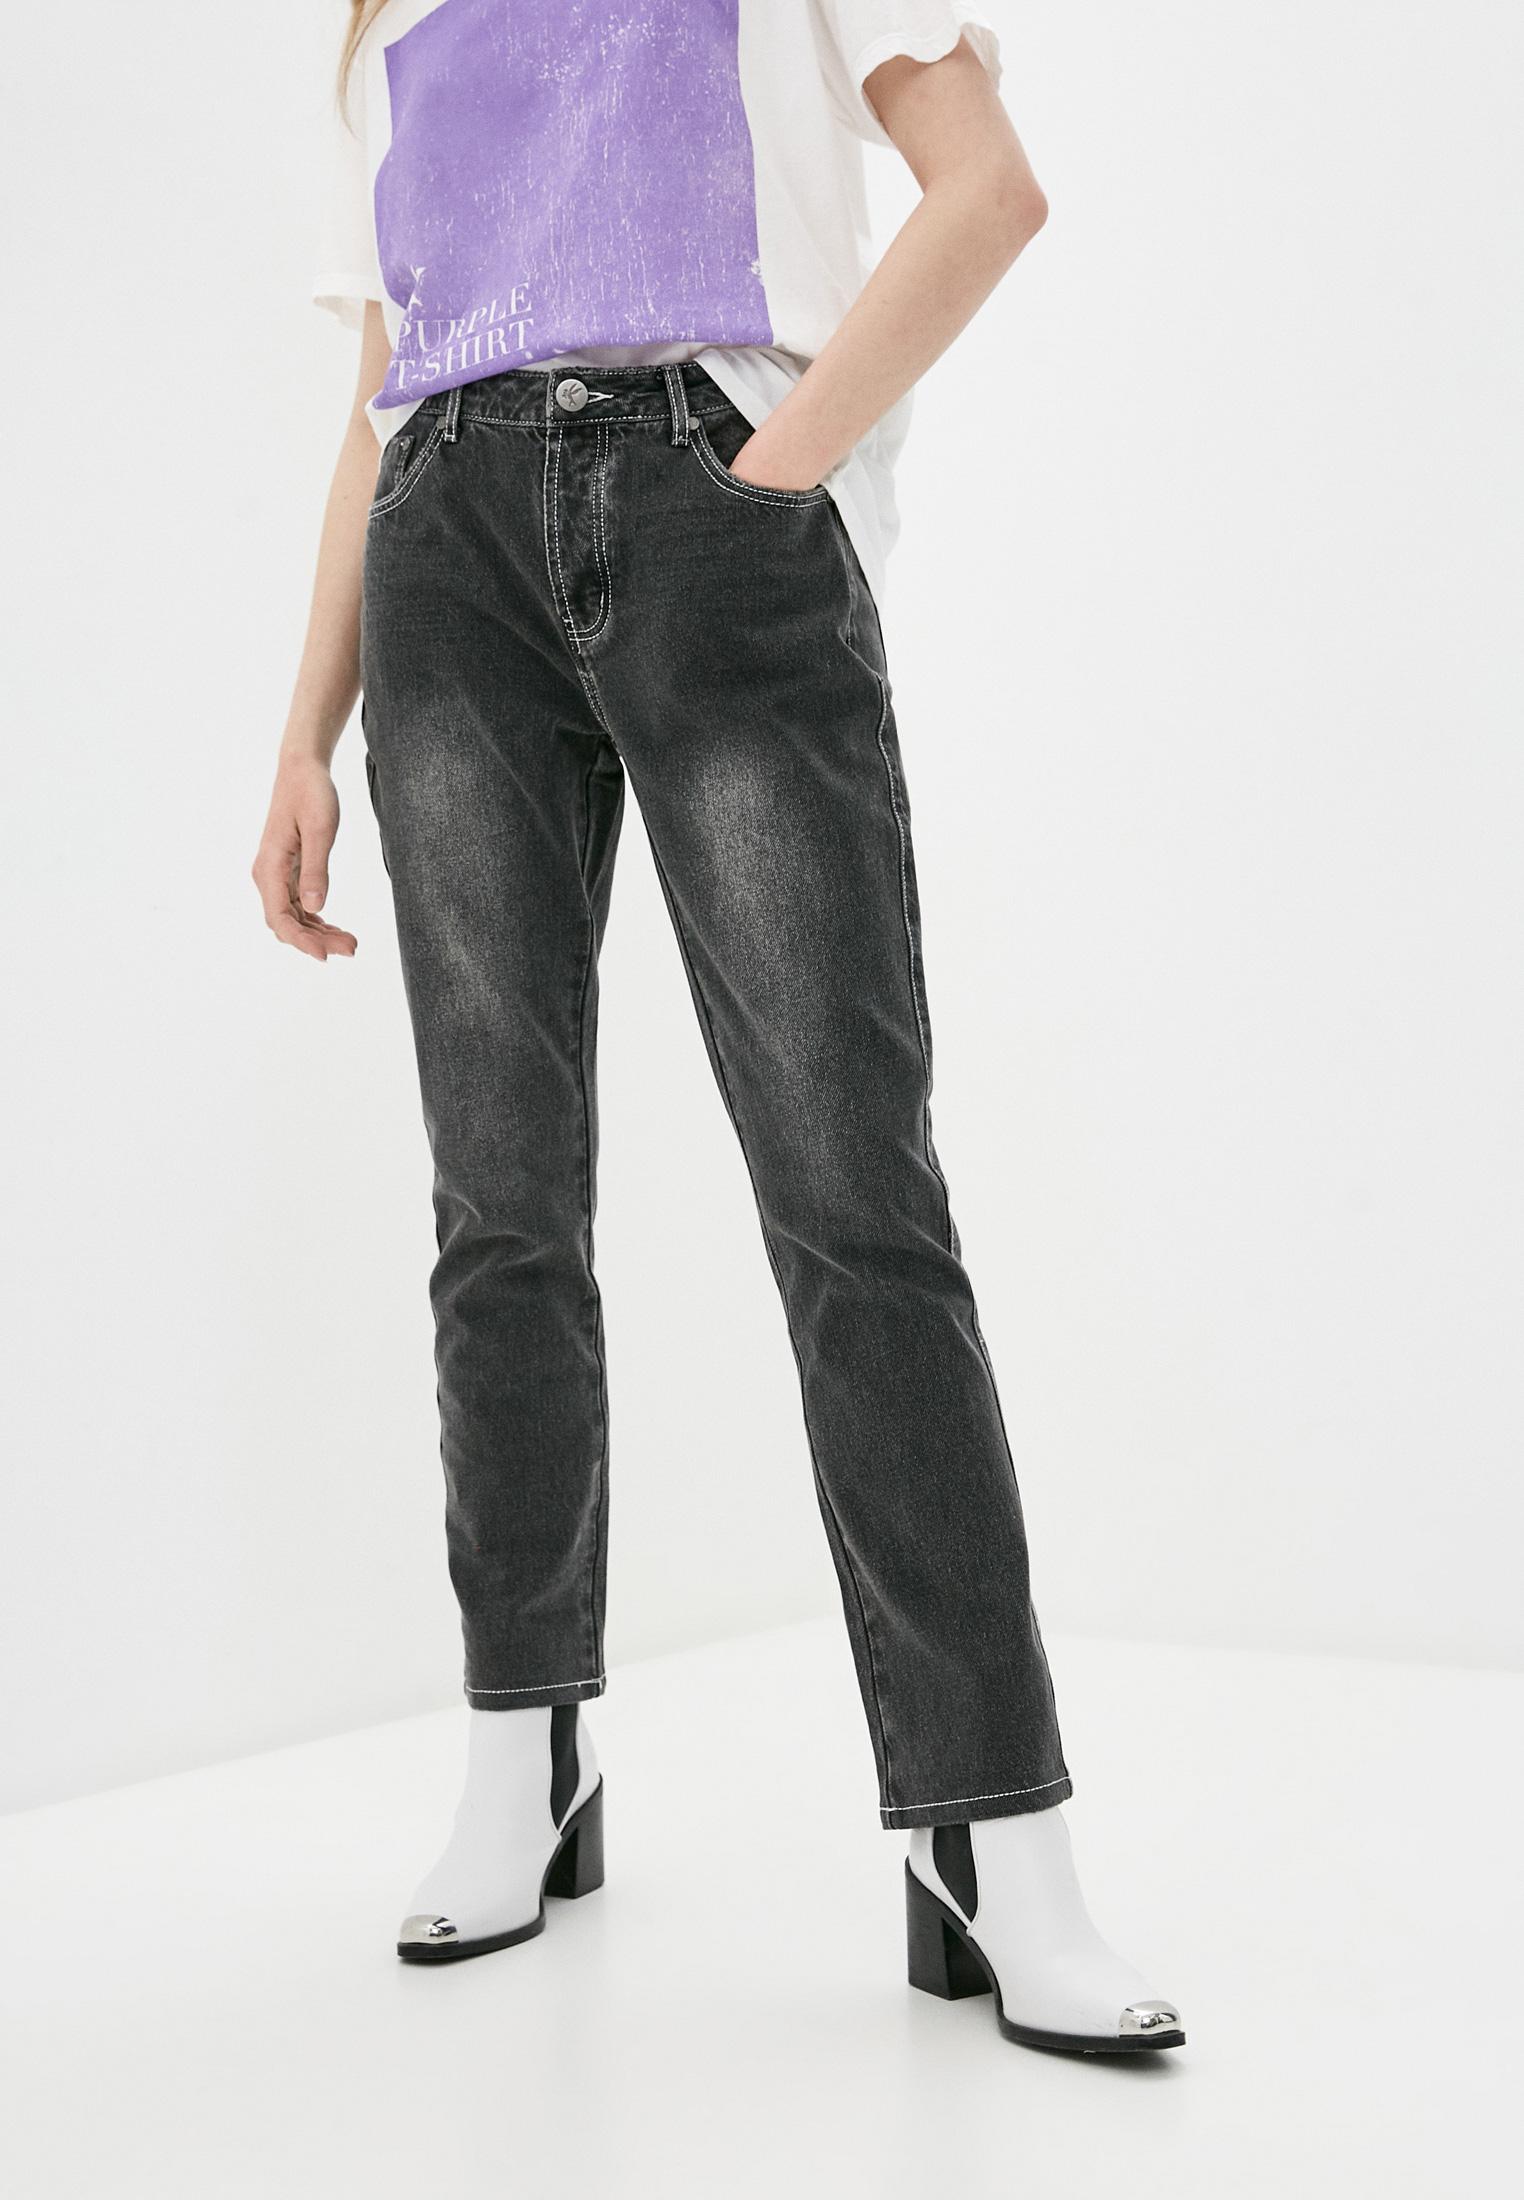 Прямые джинсы One Teaspoon (Вантиспун) 20343